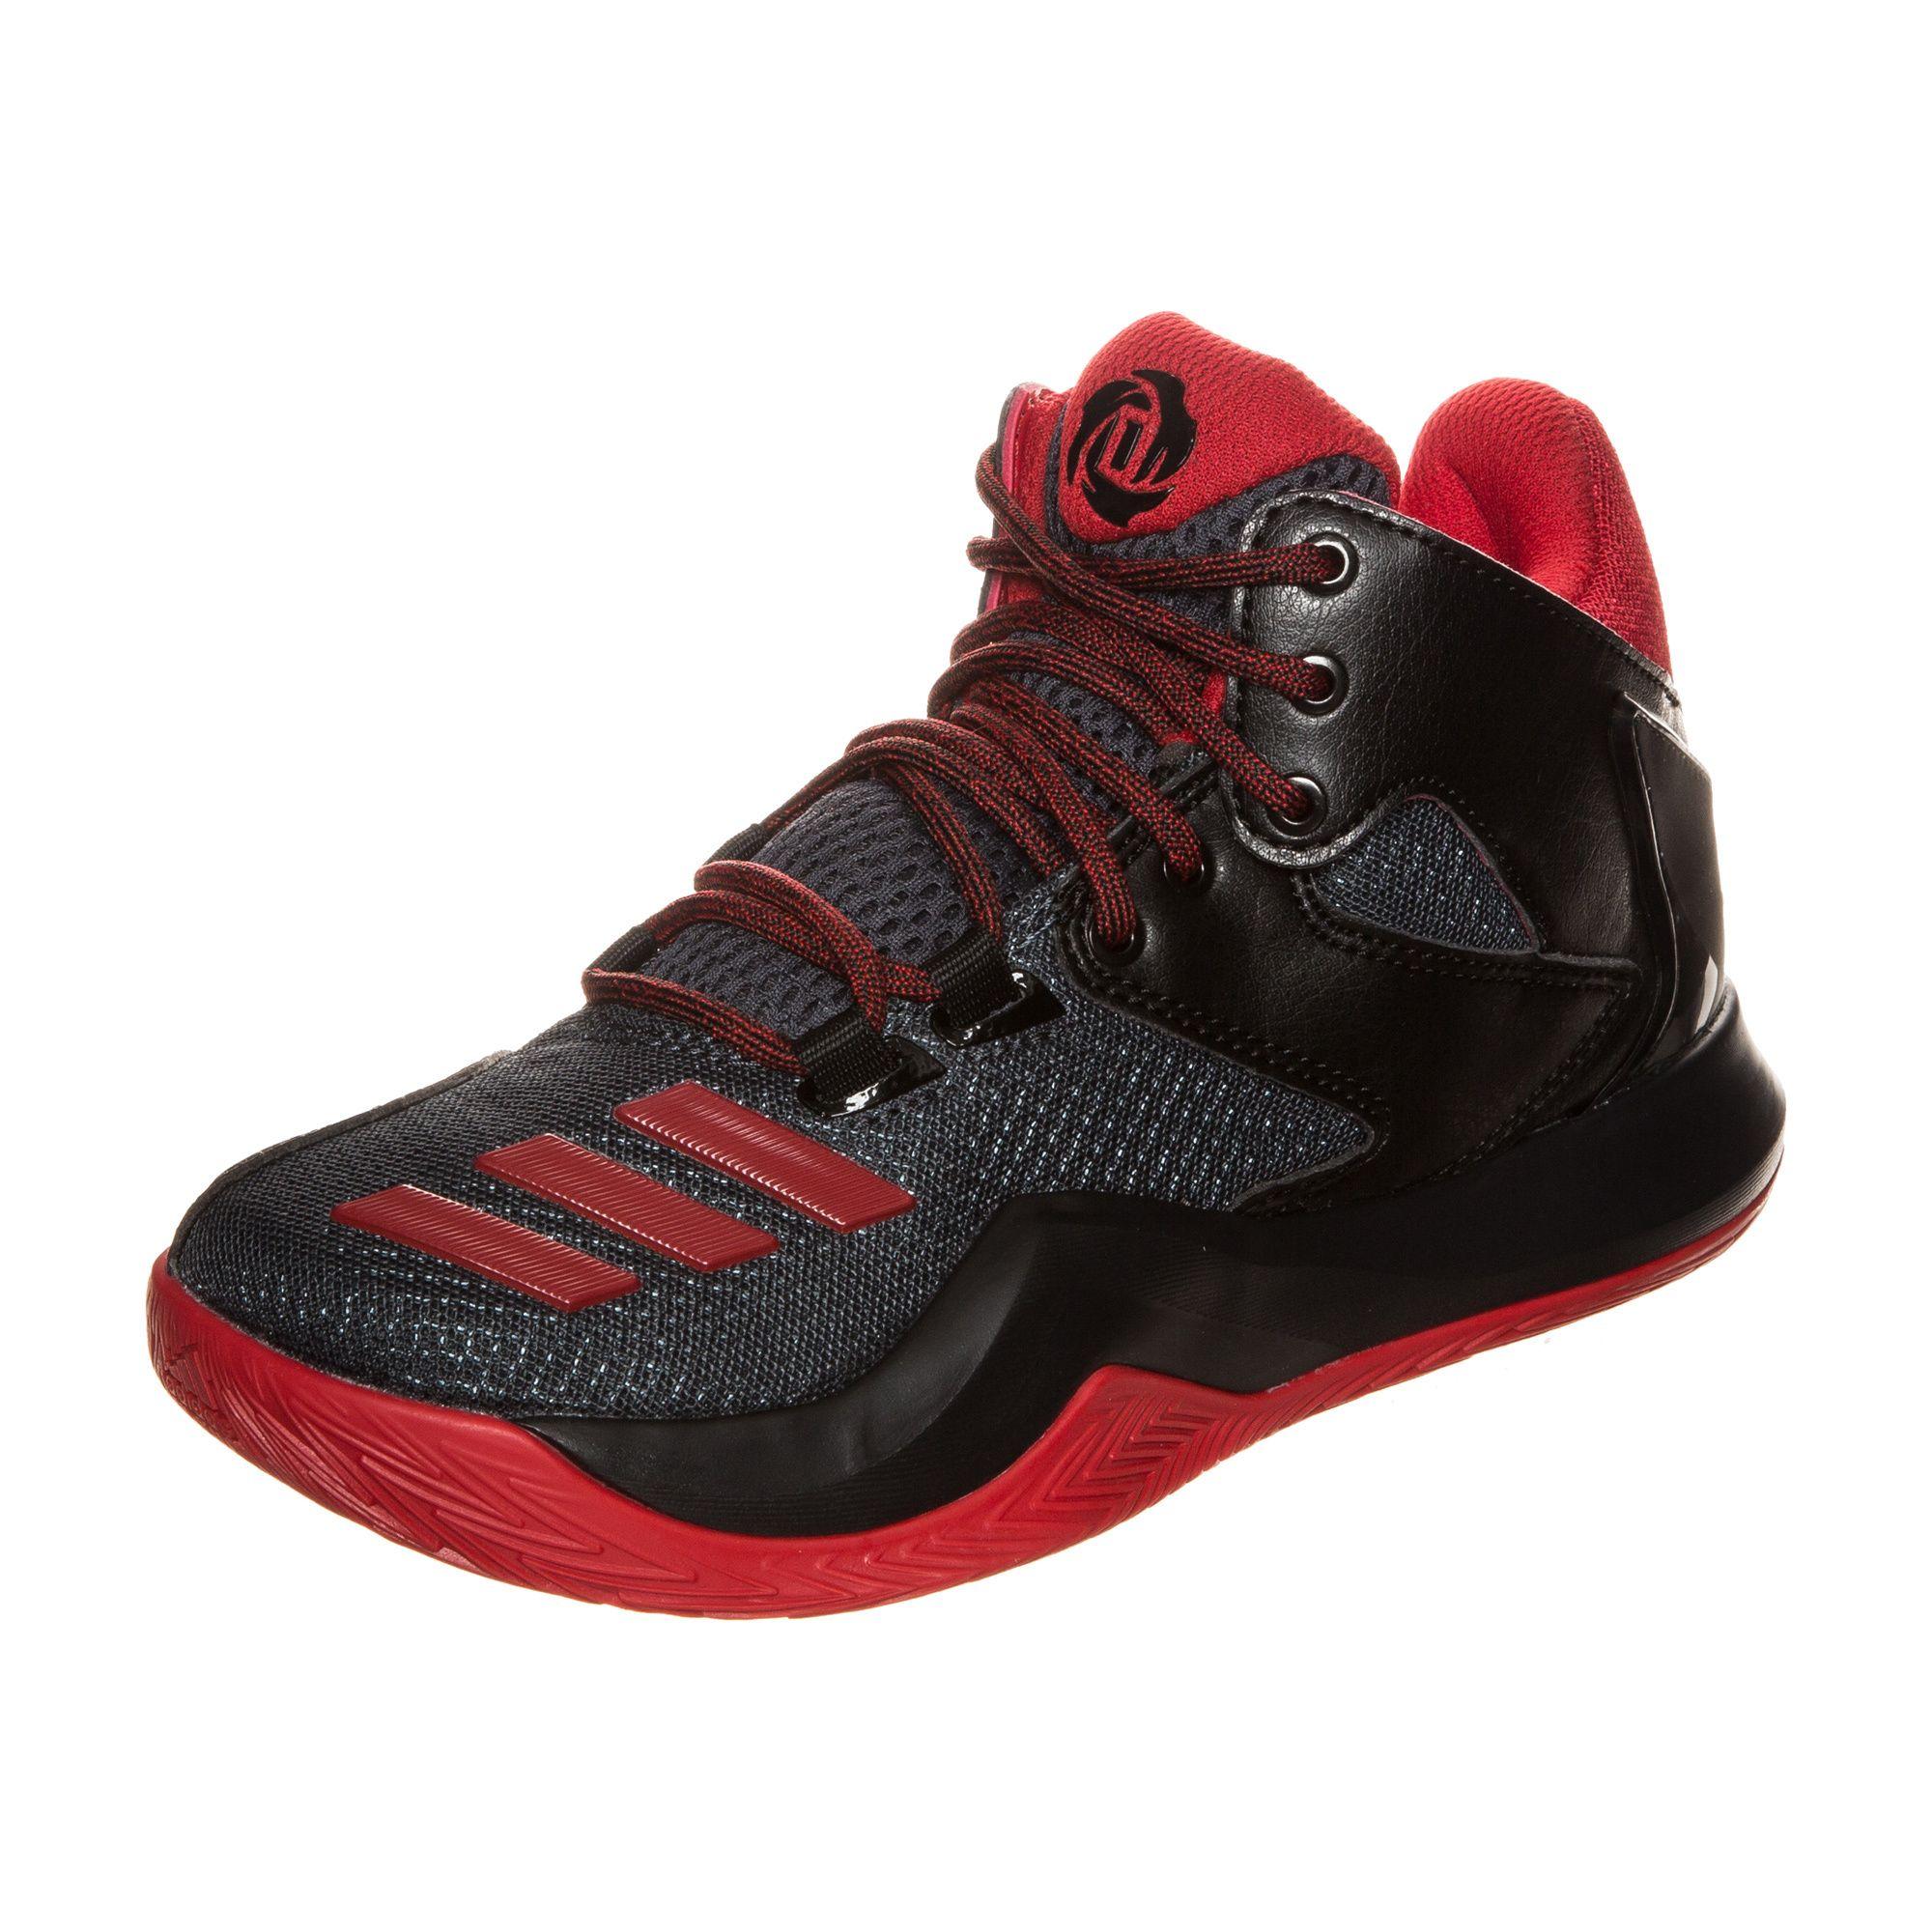 ADIDAS PERFORMANCE adidas Performance Derrick Rose 773 V Basketballschuh Kinder